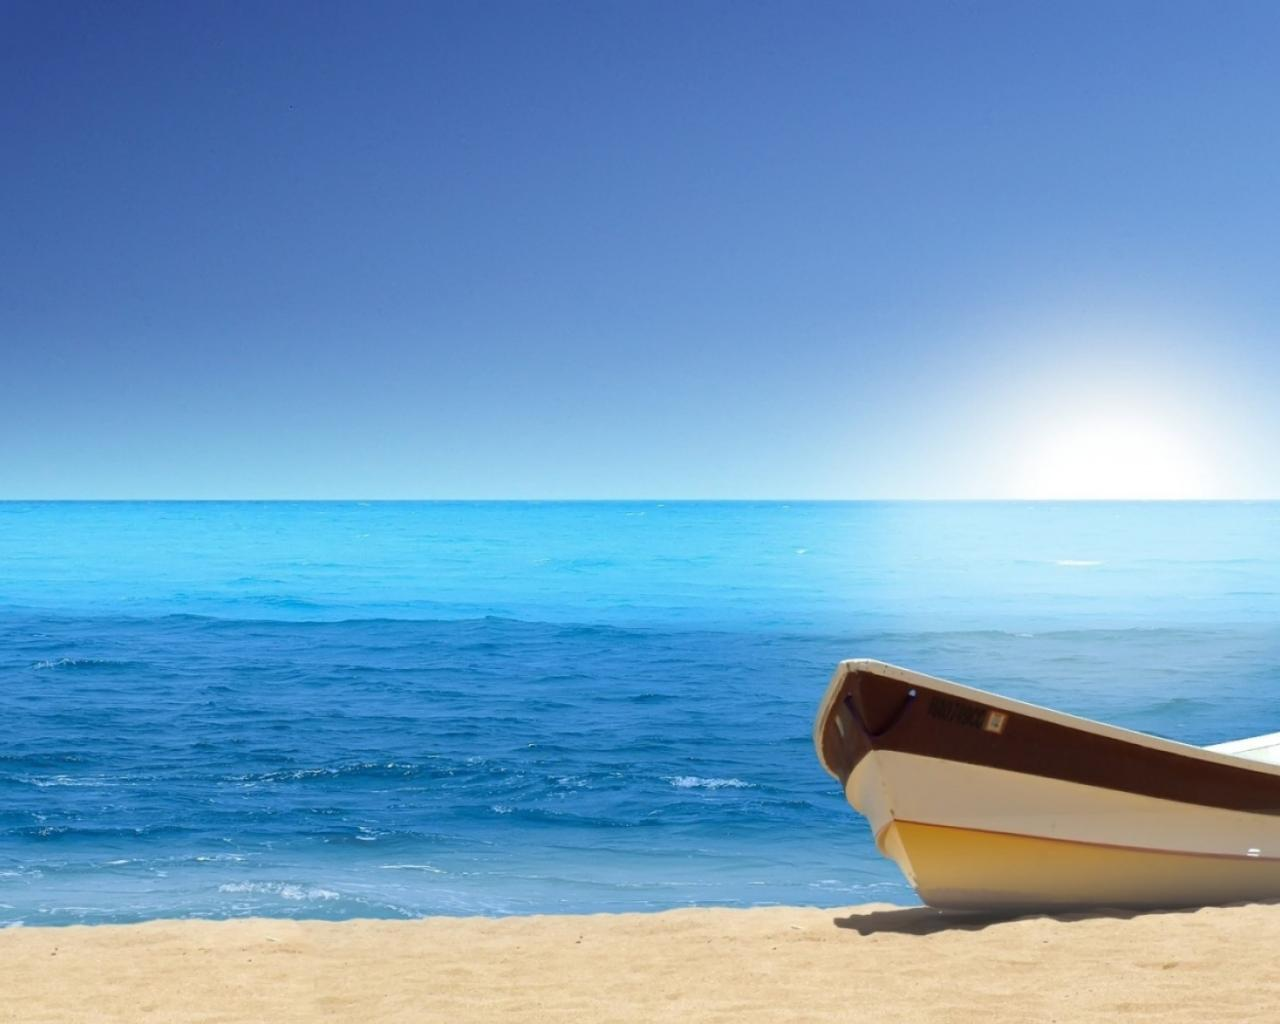 Море океан лодка пляж лето отдых